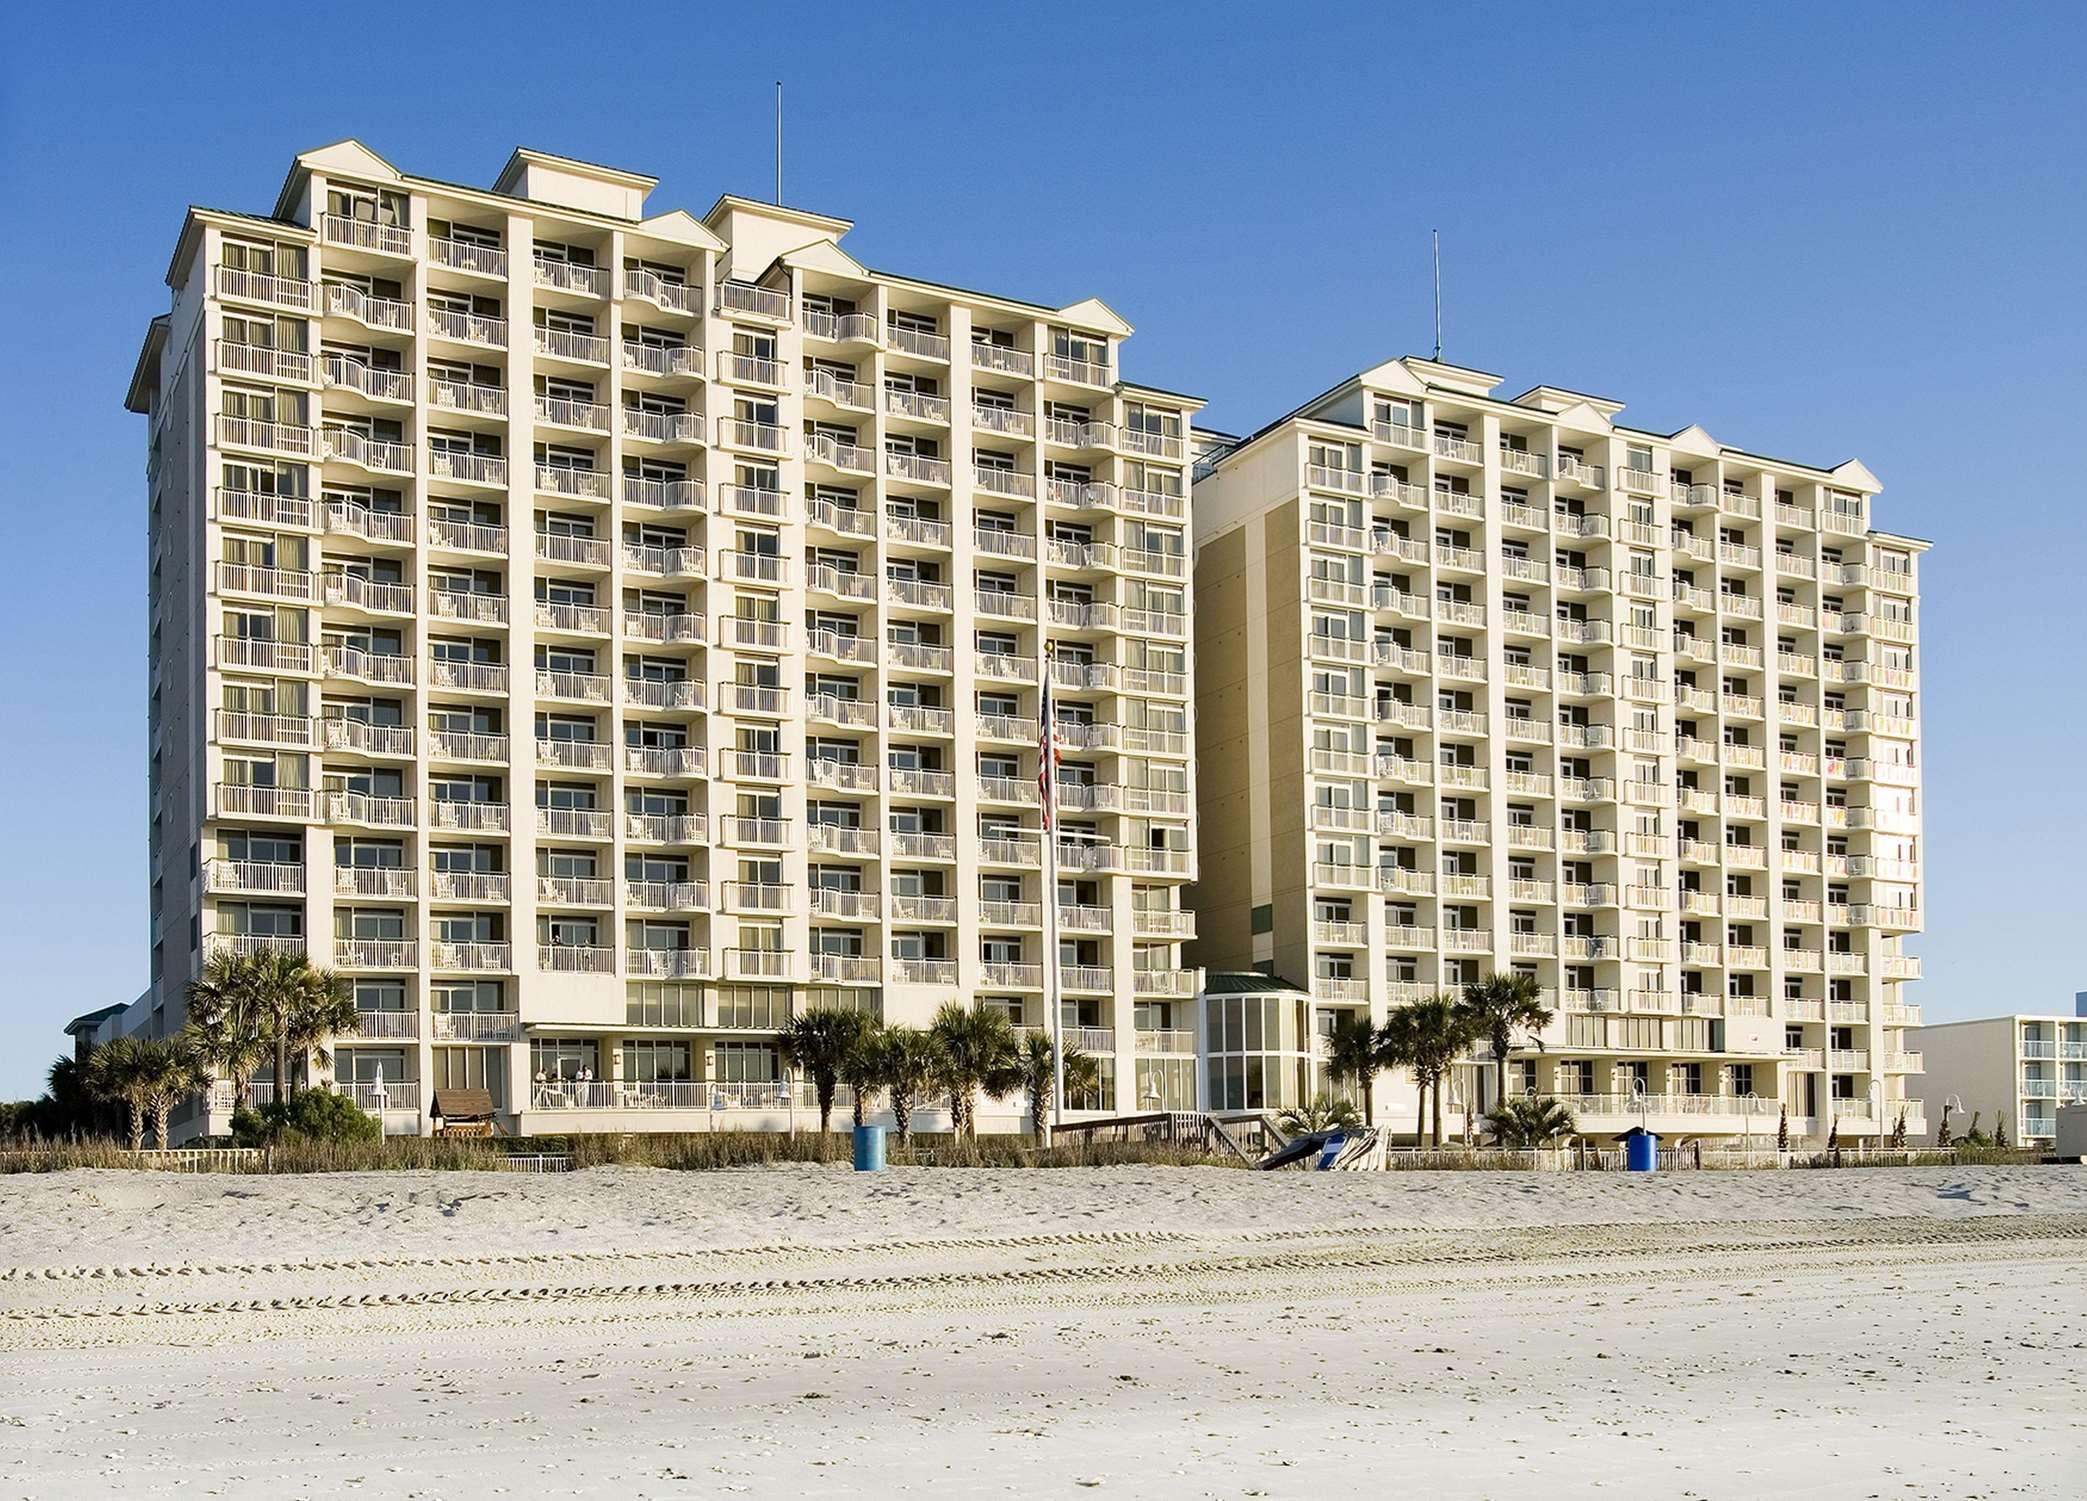 Hotels On Kings Highway Myrtle Beach Sc